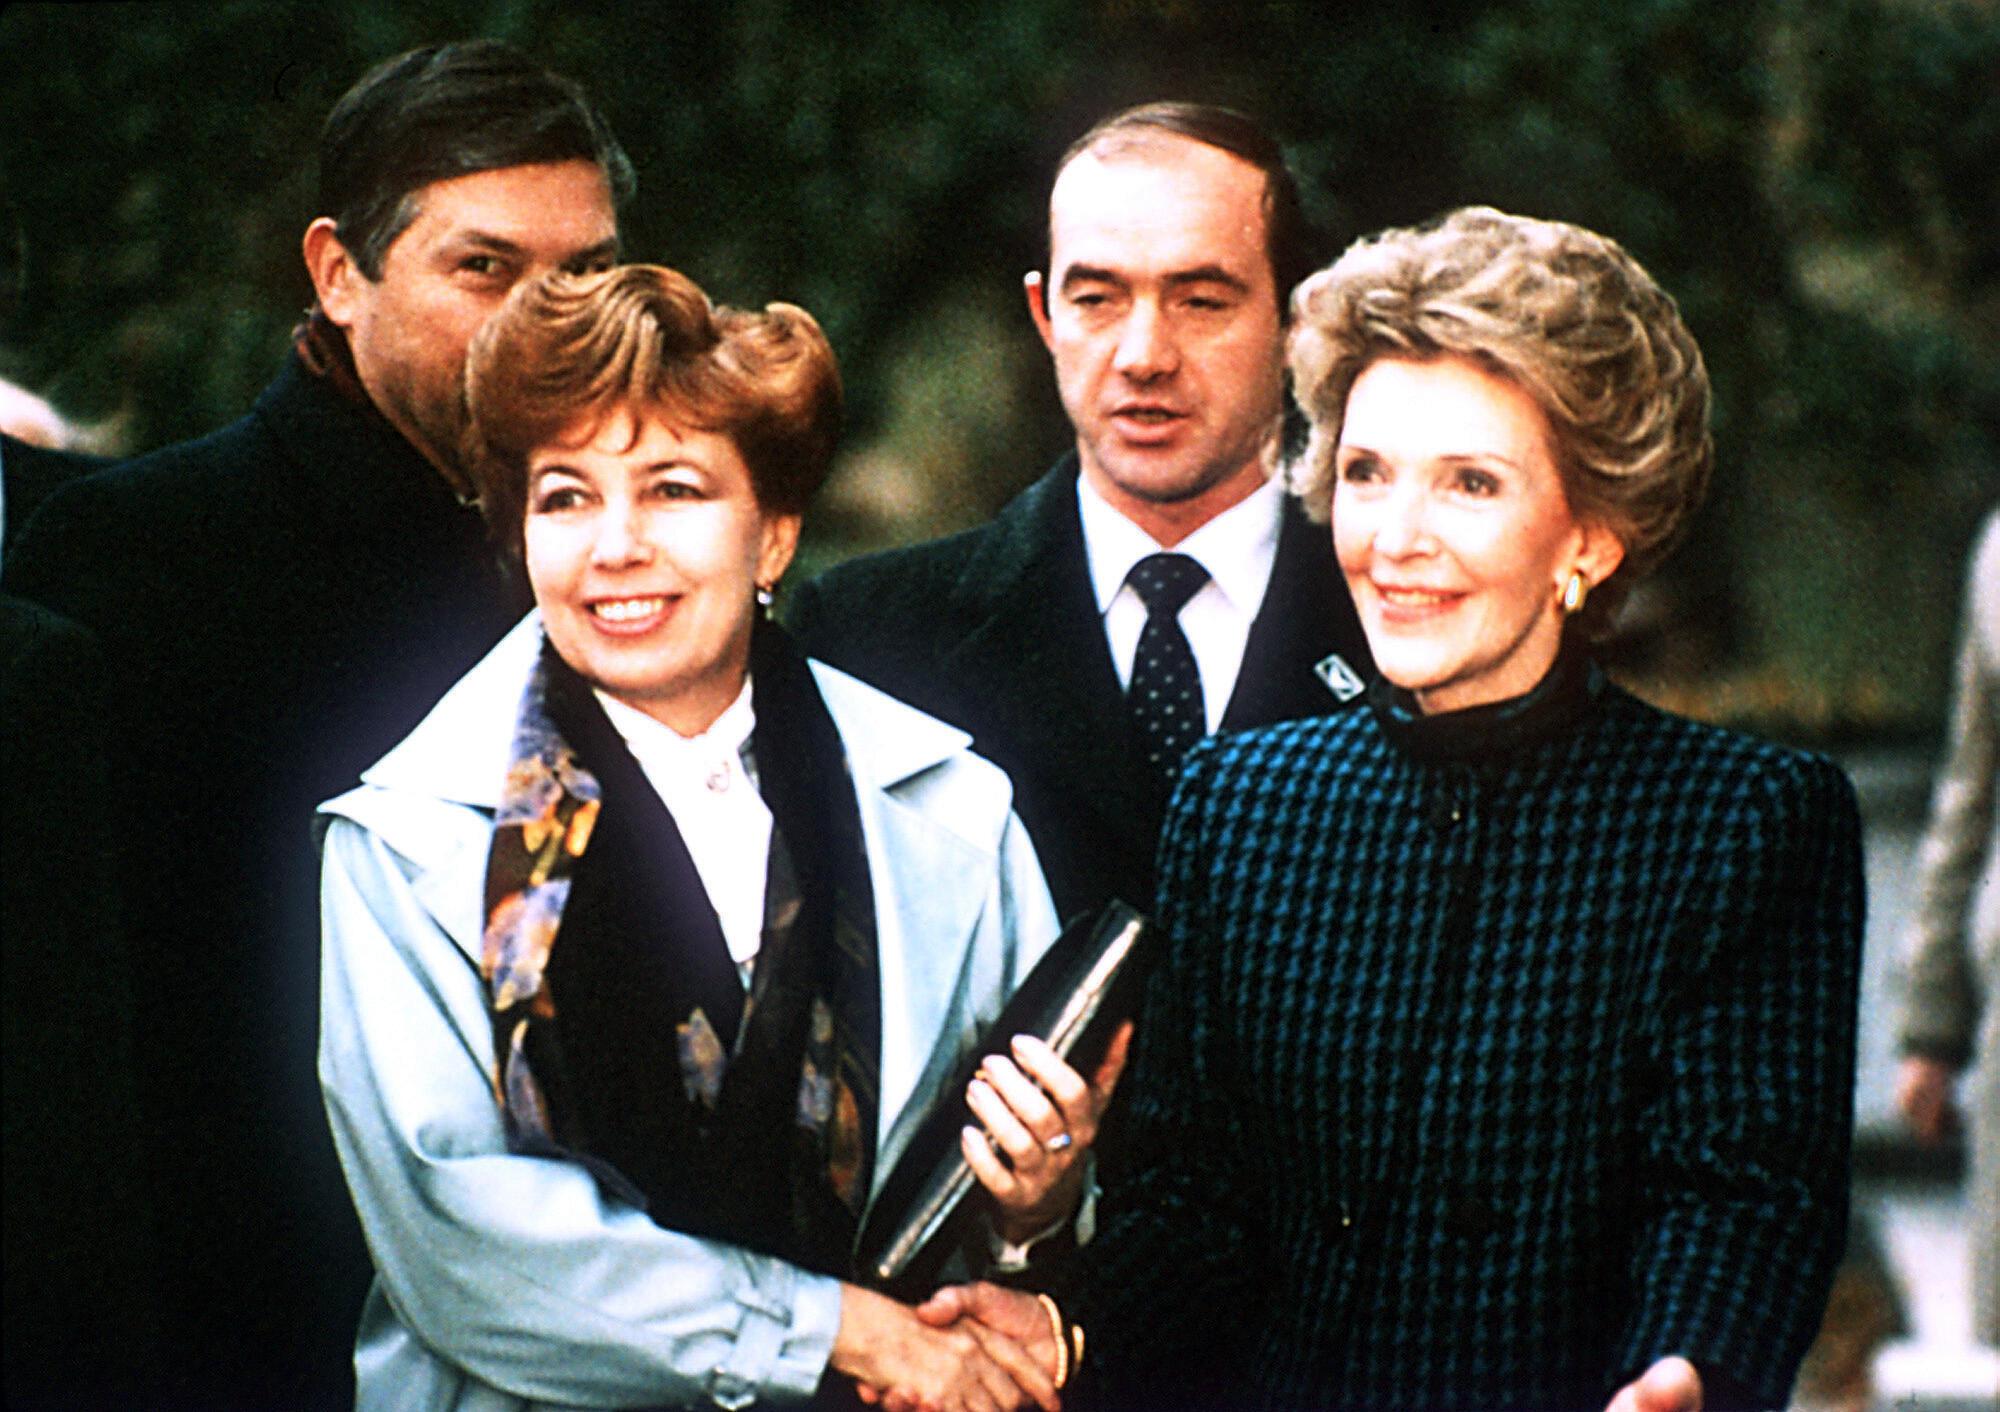 Раиса Максимовна Горбачева и Нэнси Рейган в Женеве (1985)